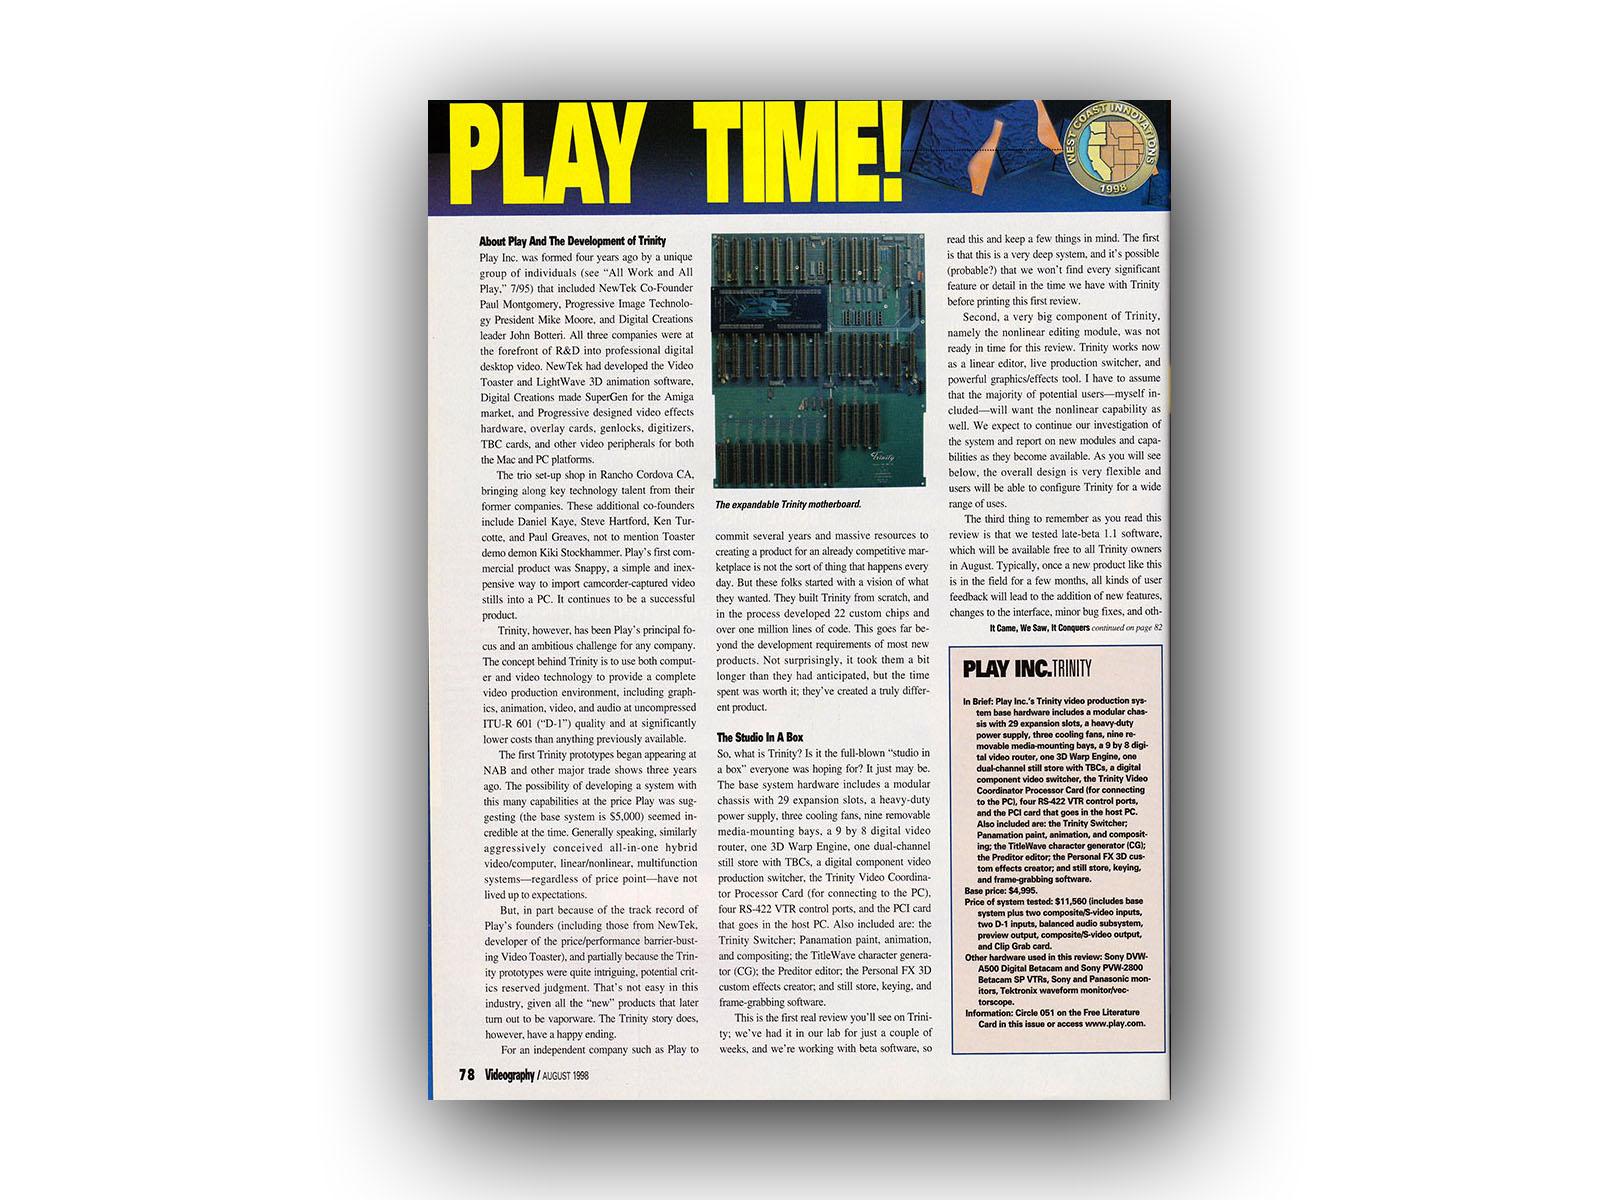 _0010_MagazineVideography-Fall98-P78_web.jpg